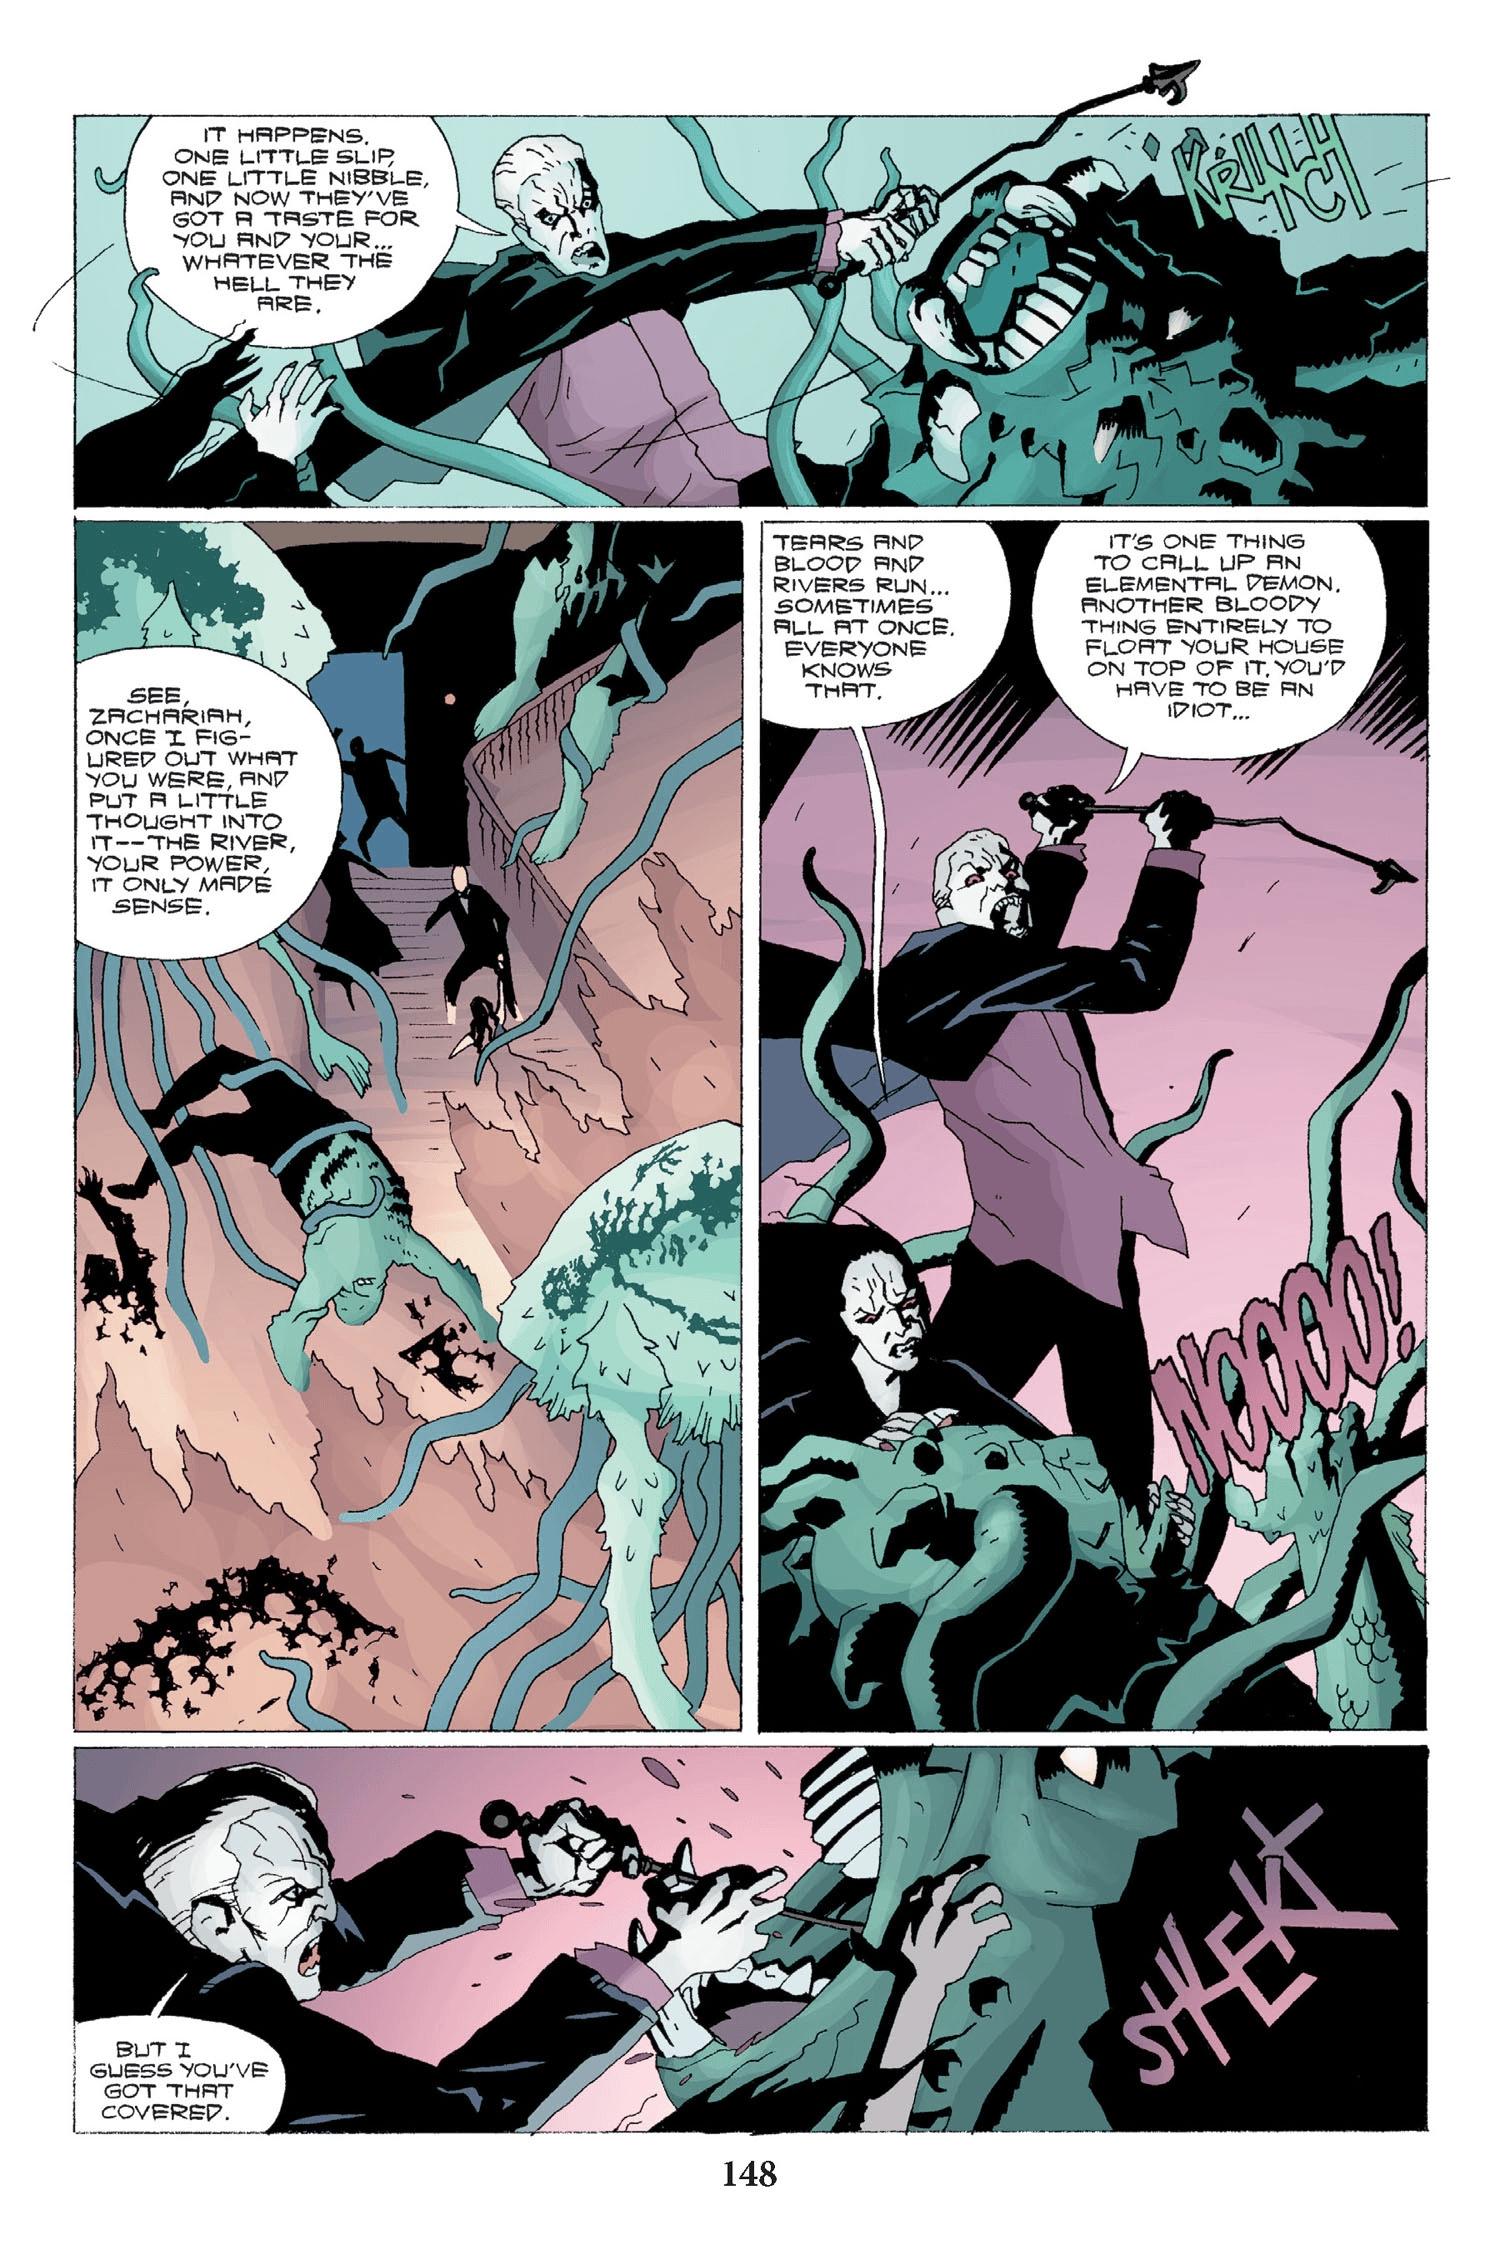 Read online Buffy the Vampire Slayer: Omnibus comic -  Issue # TPB 2 - 142